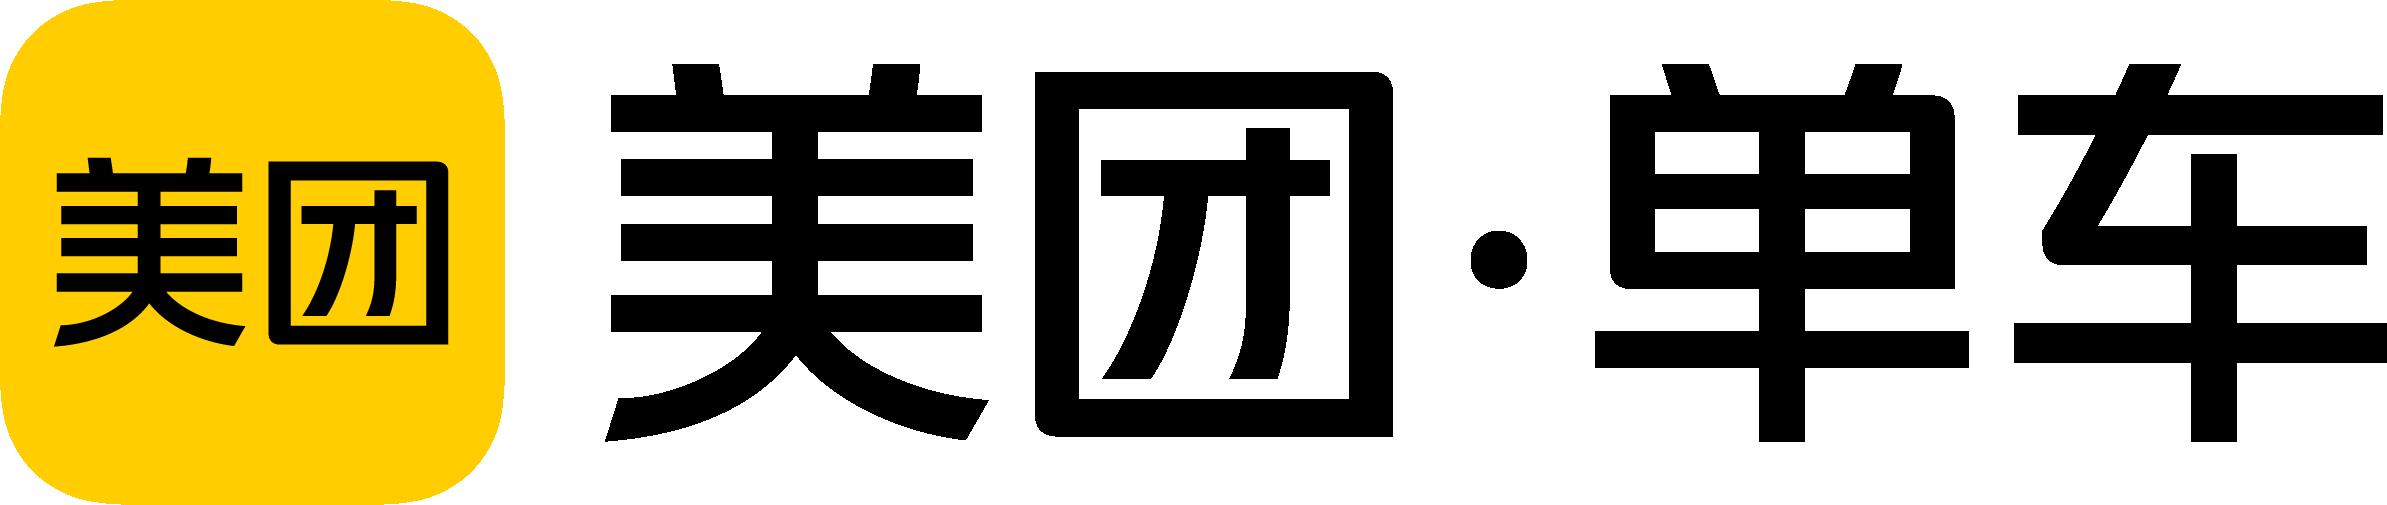 Meituan